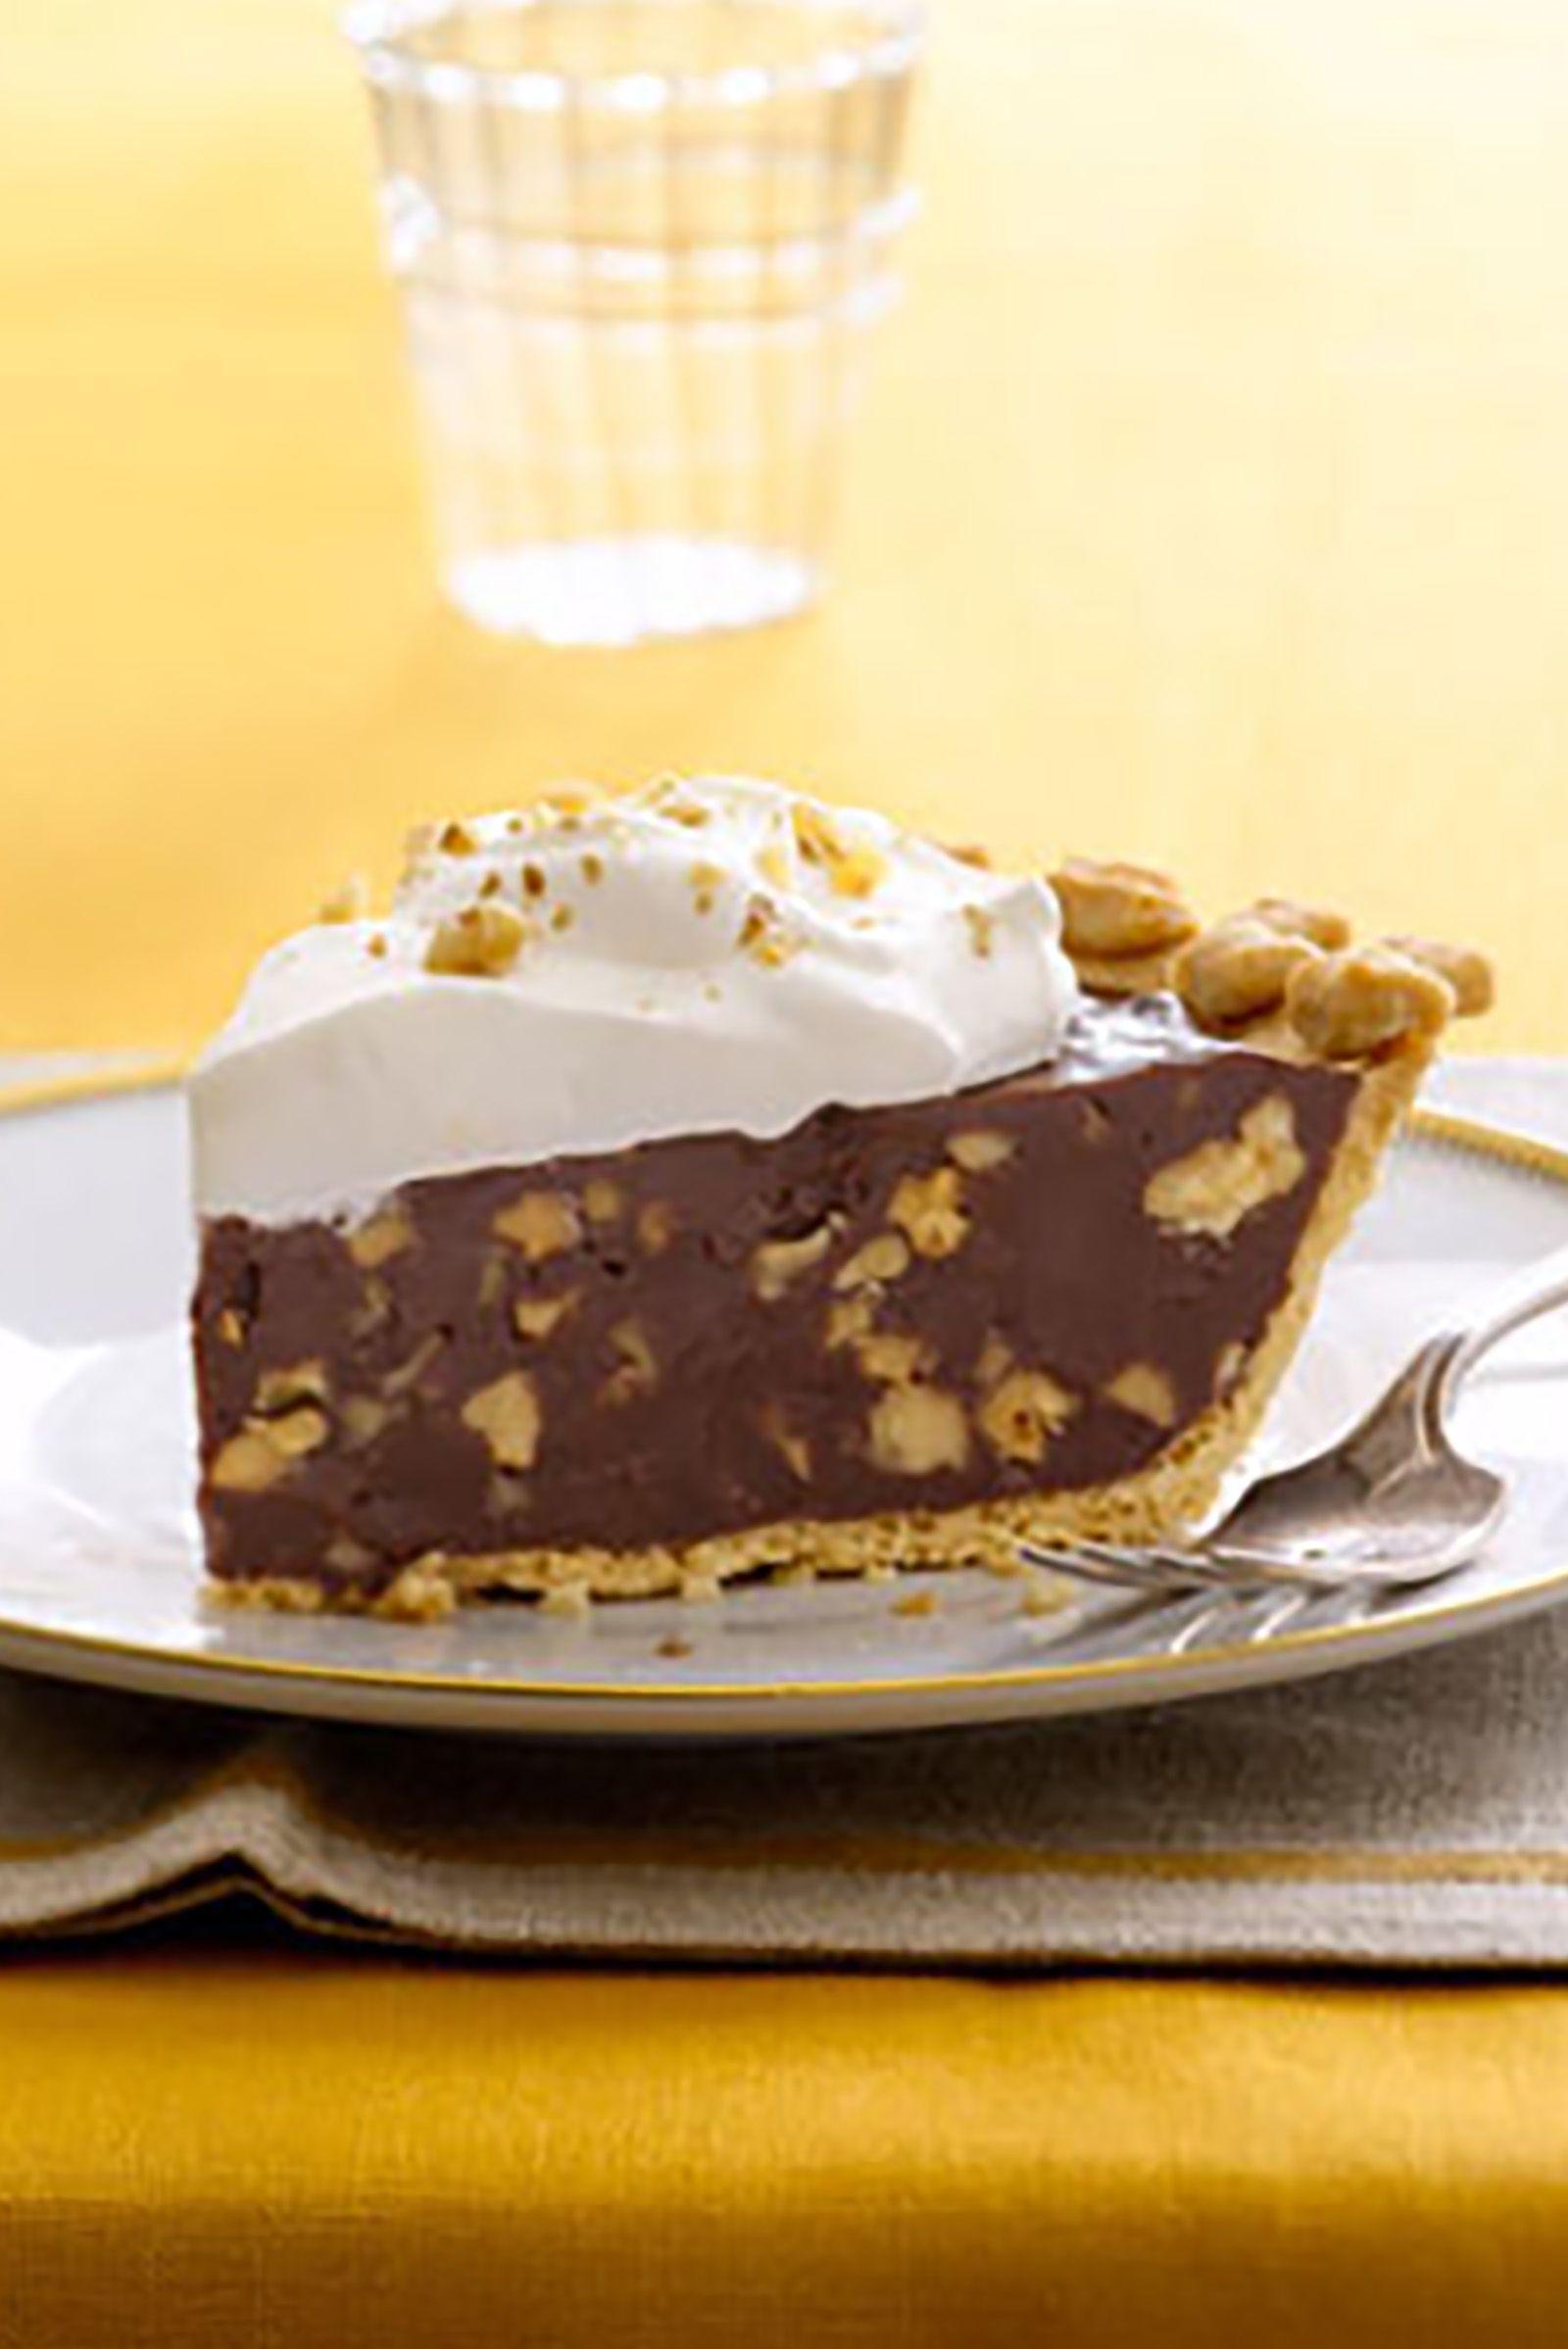 18 easy chocolate pie recipes - how to make chocolate pies